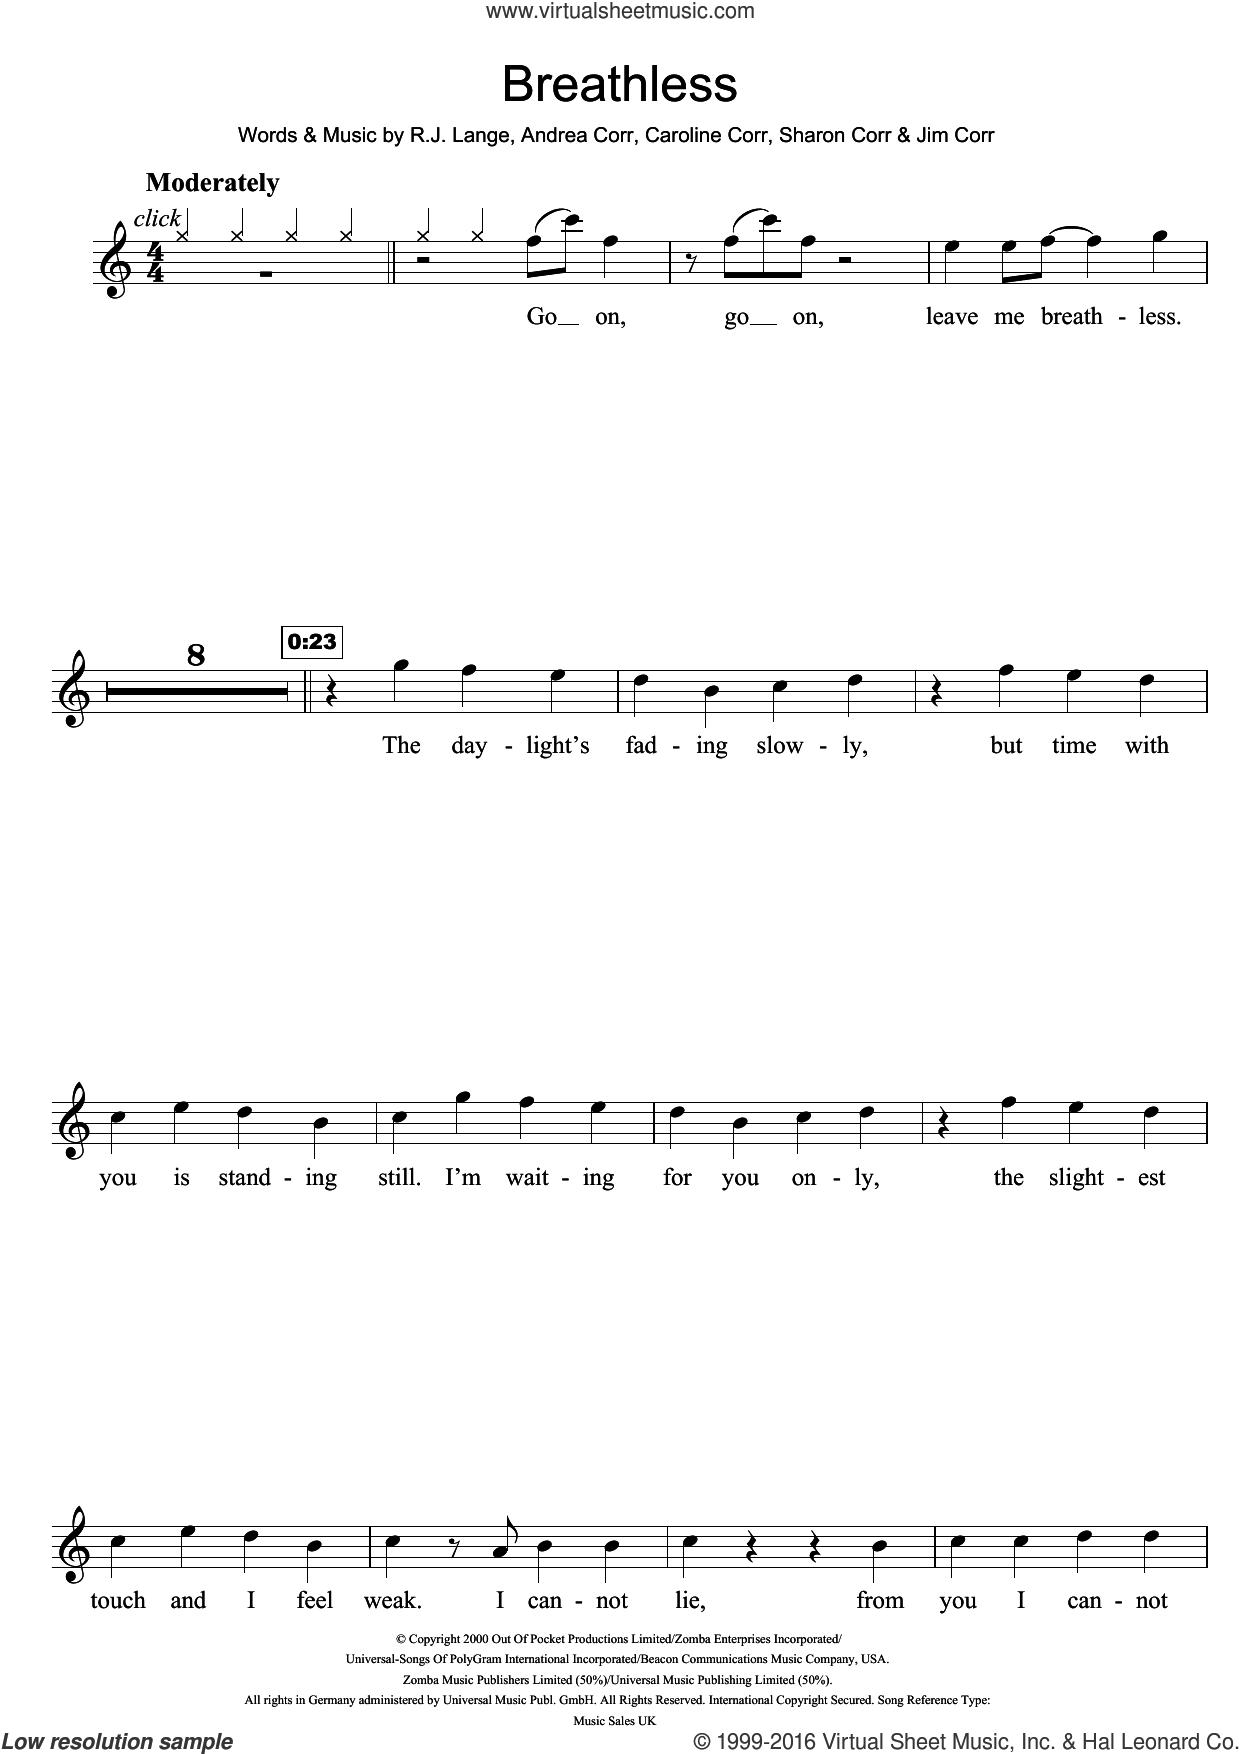 Breathless sheet music for flute solo by The Corrs, Andrea Corr, Caroline Corr, Jim Corr, Robert John Lange and Sharon Corr, intermediate skill level